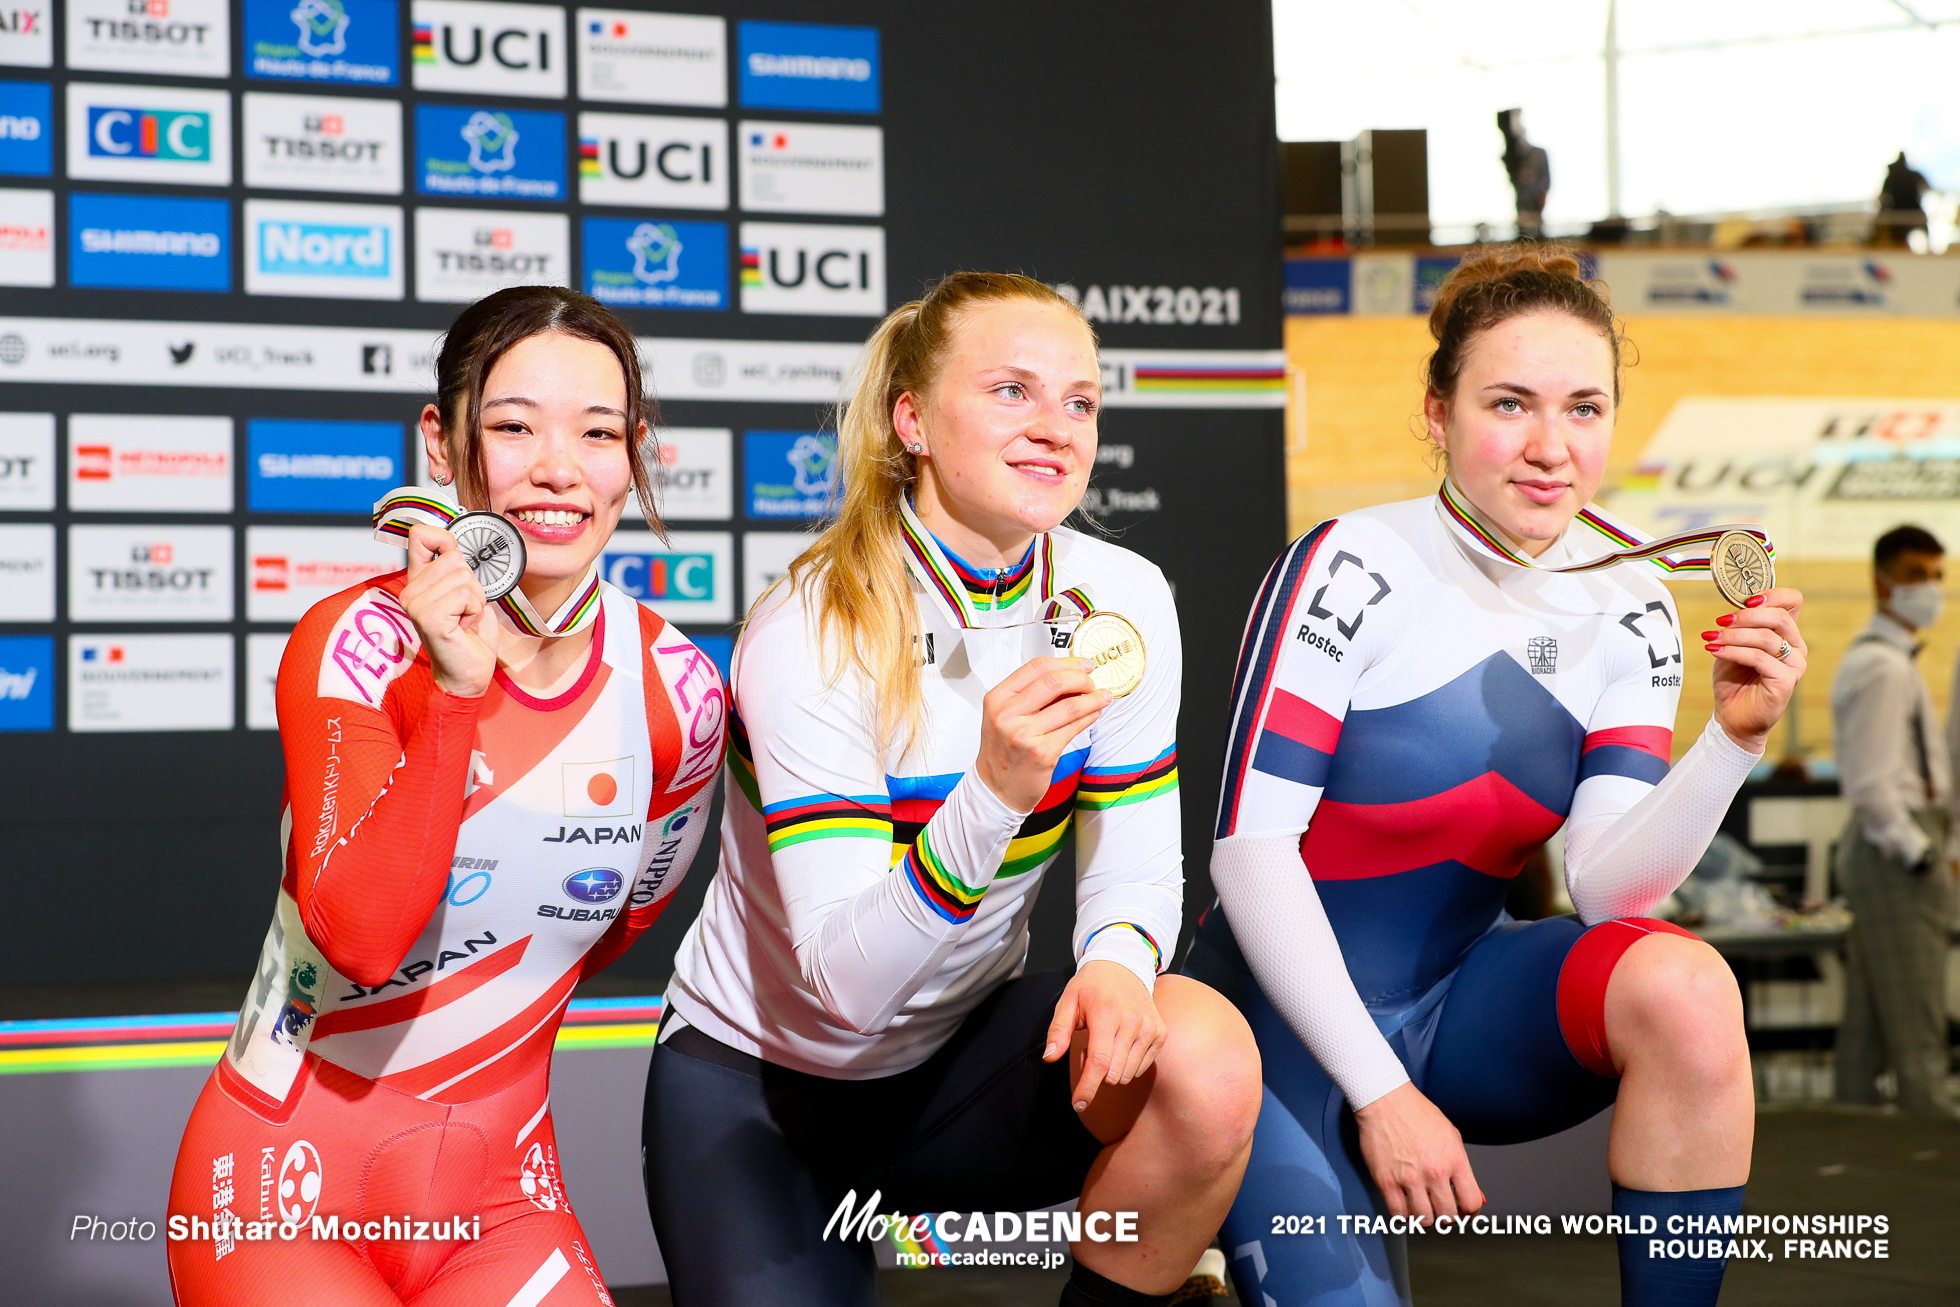 Women's Keirin Podium / 2021 Track Cycling World Championships, Roubaix, FRIEDRICH Lea Sophie(GER)リー ソフィー・フリードリッヒ,SATO Mina(JPN)佐藤水菜, TYSHCHENKO Yana(RCF)ヤナ・ティシュチェンコ